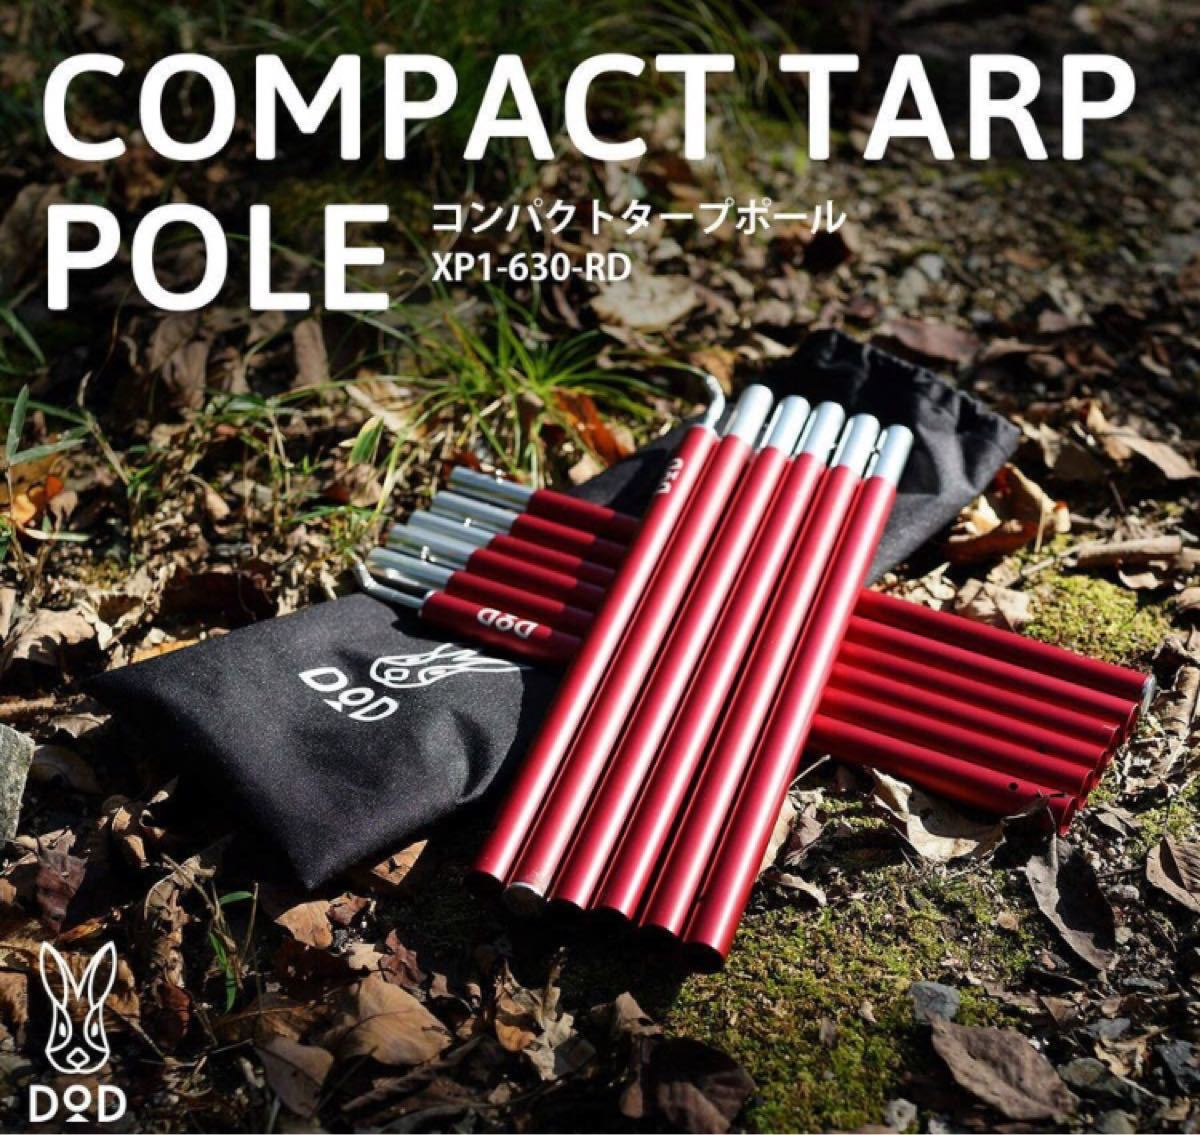 DOD コンパクトタープポール新品2本セットXP1-630-RDレッド新品未開封  タープポール キャノピーポール キャンプ用品